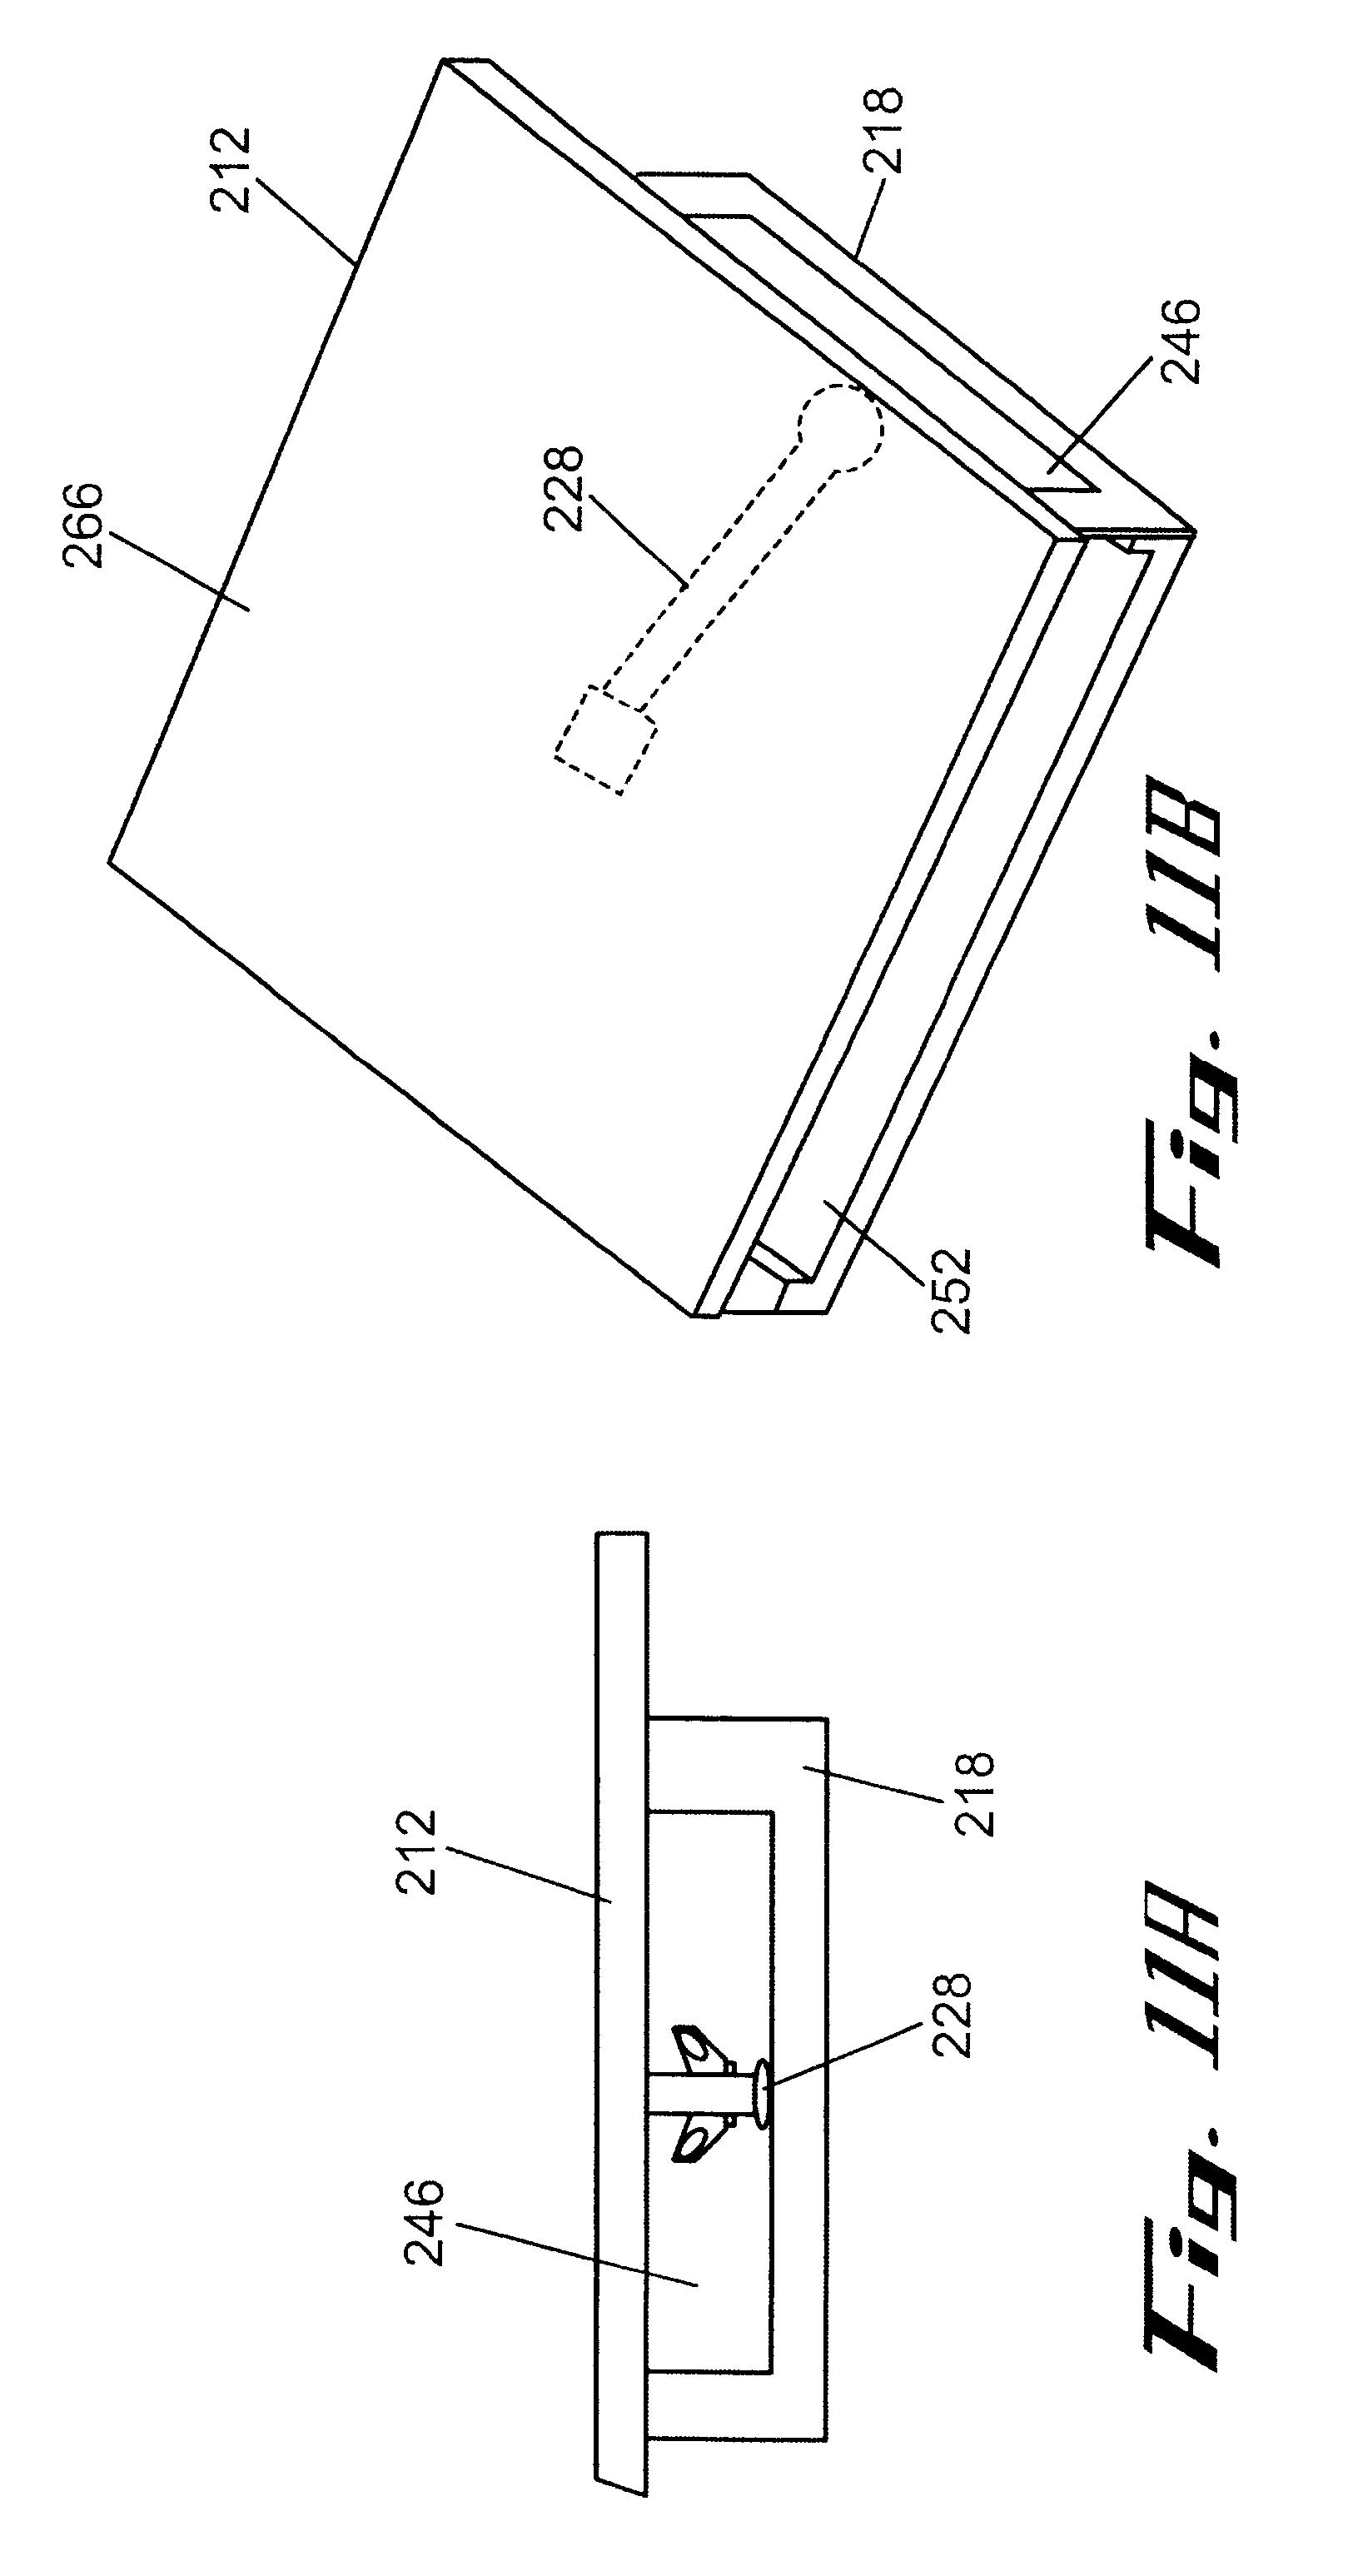 Patent Us6493220 Mobile Clinical Workstation Google Patents Ezgo Wiring Diagram 1995 Mack Truck Wiring Diagram On Clark Gcx 25e Wiring Diagram #78